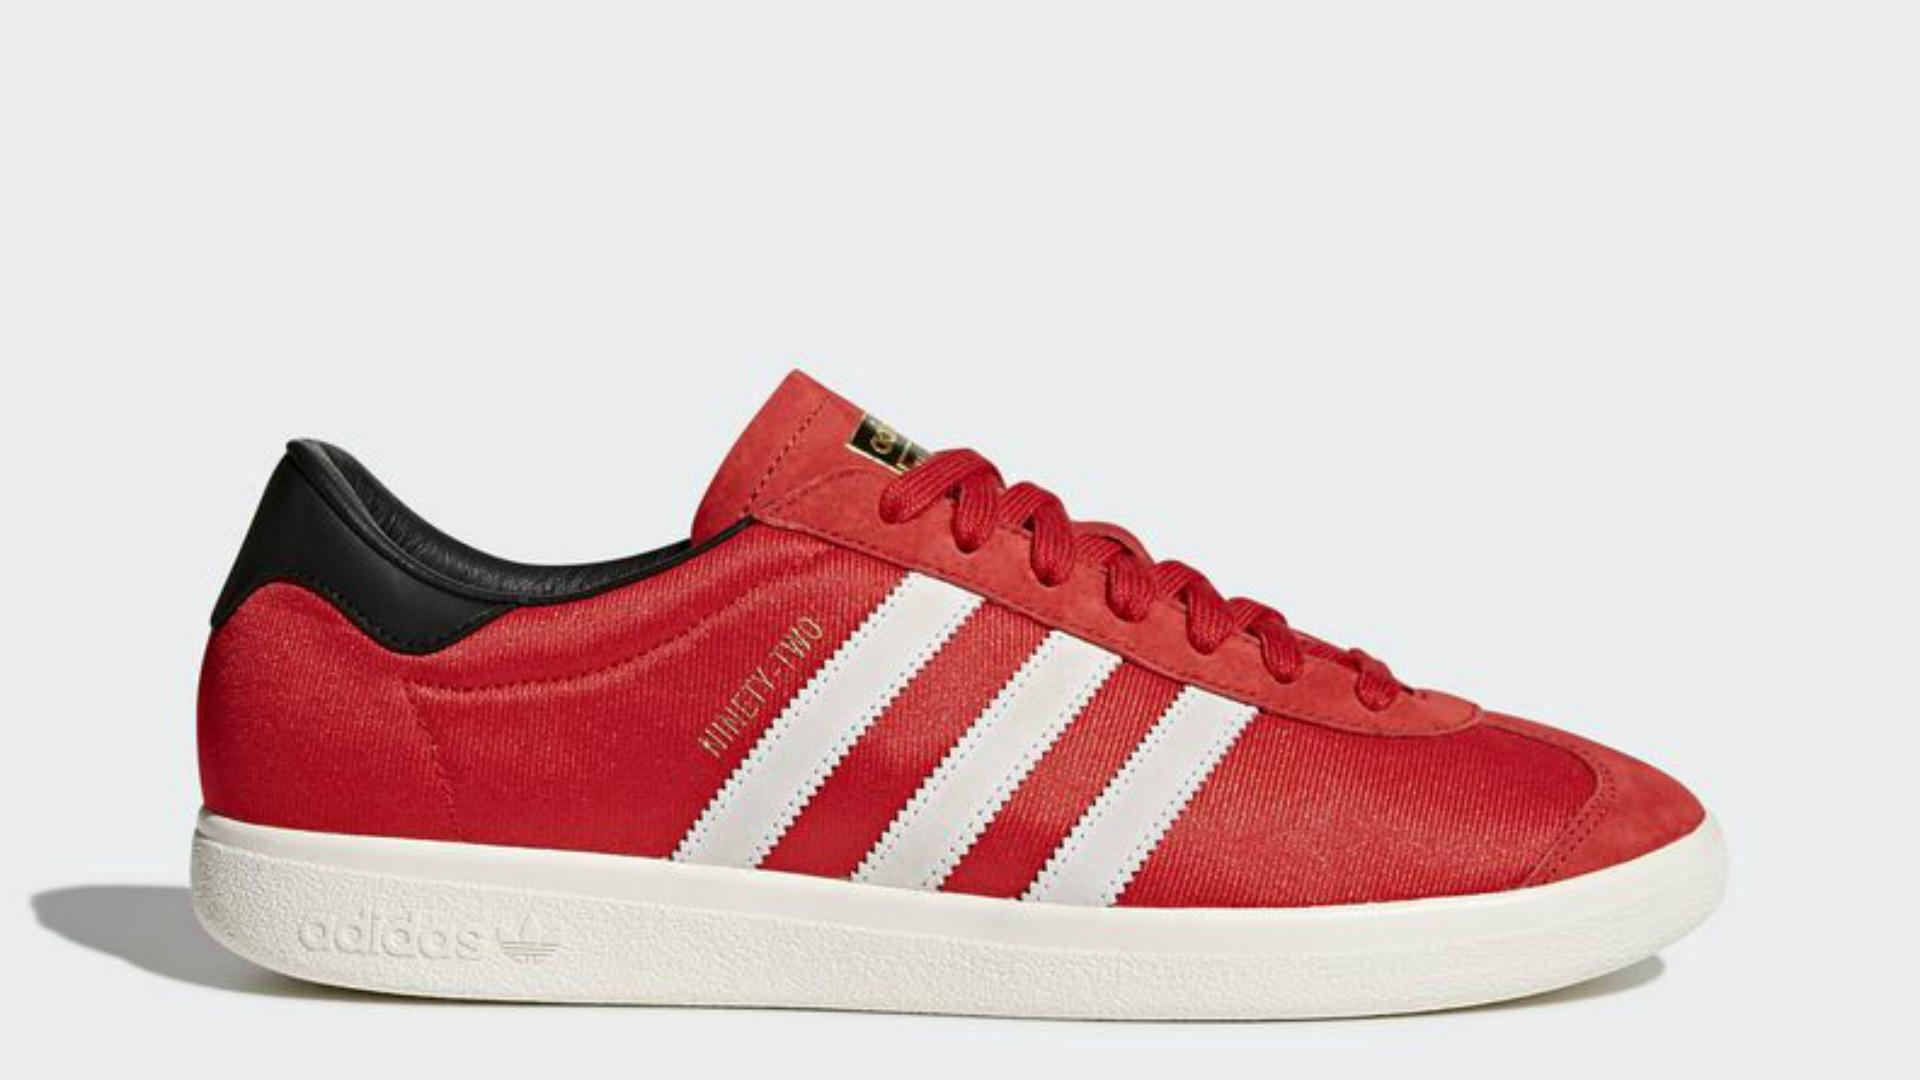 Adidas Ninety Two Shoes